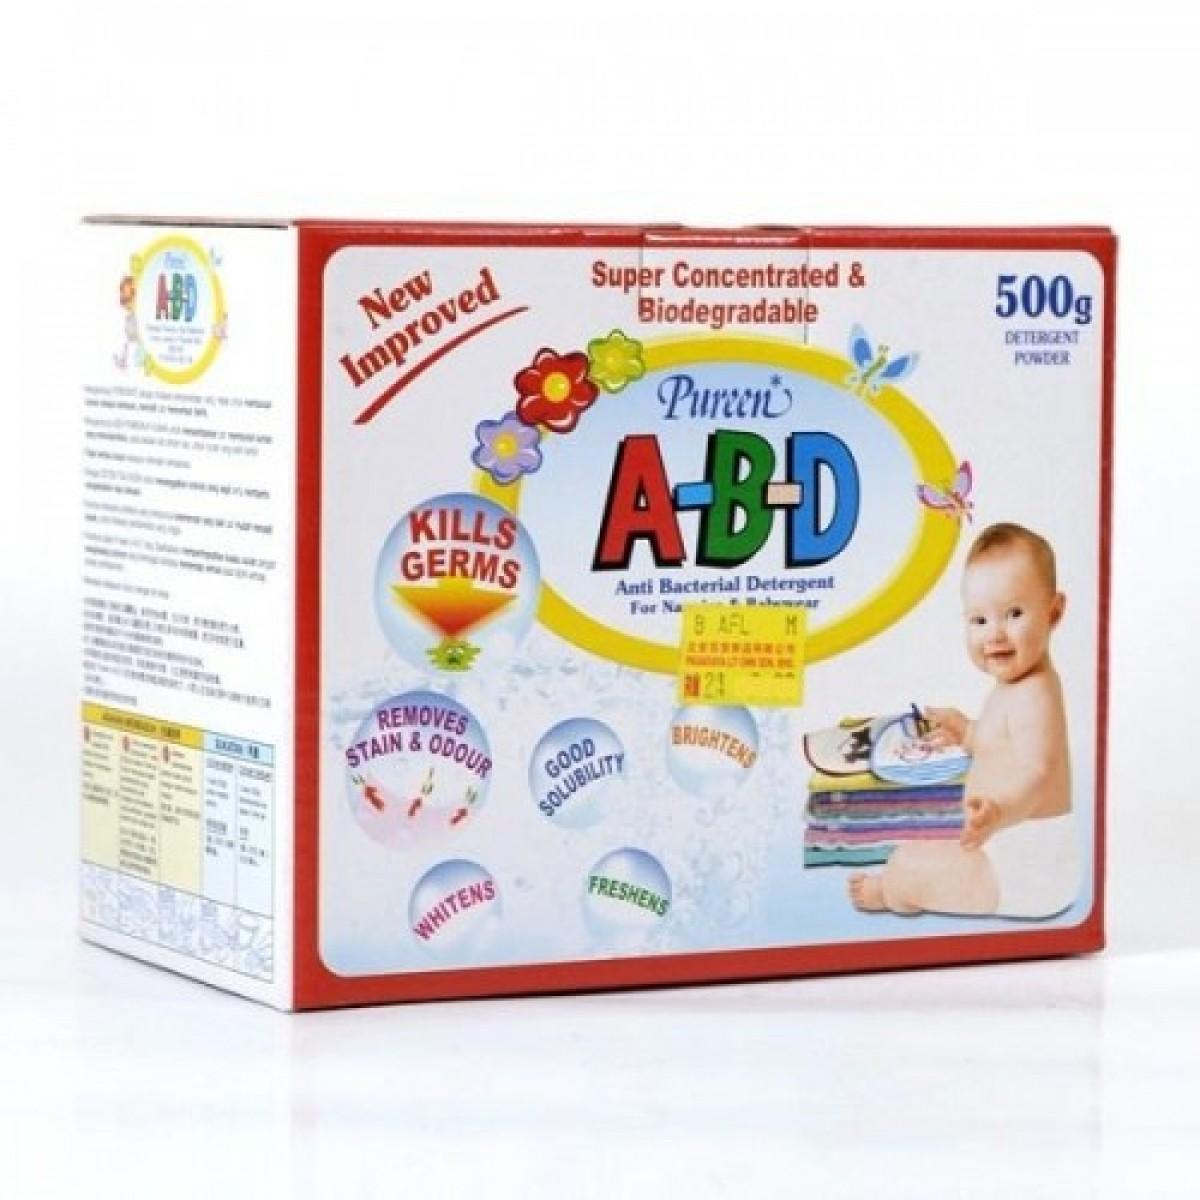 Pureen Abd Anti Bacterial Detergent (500g) - Kico Baby Center